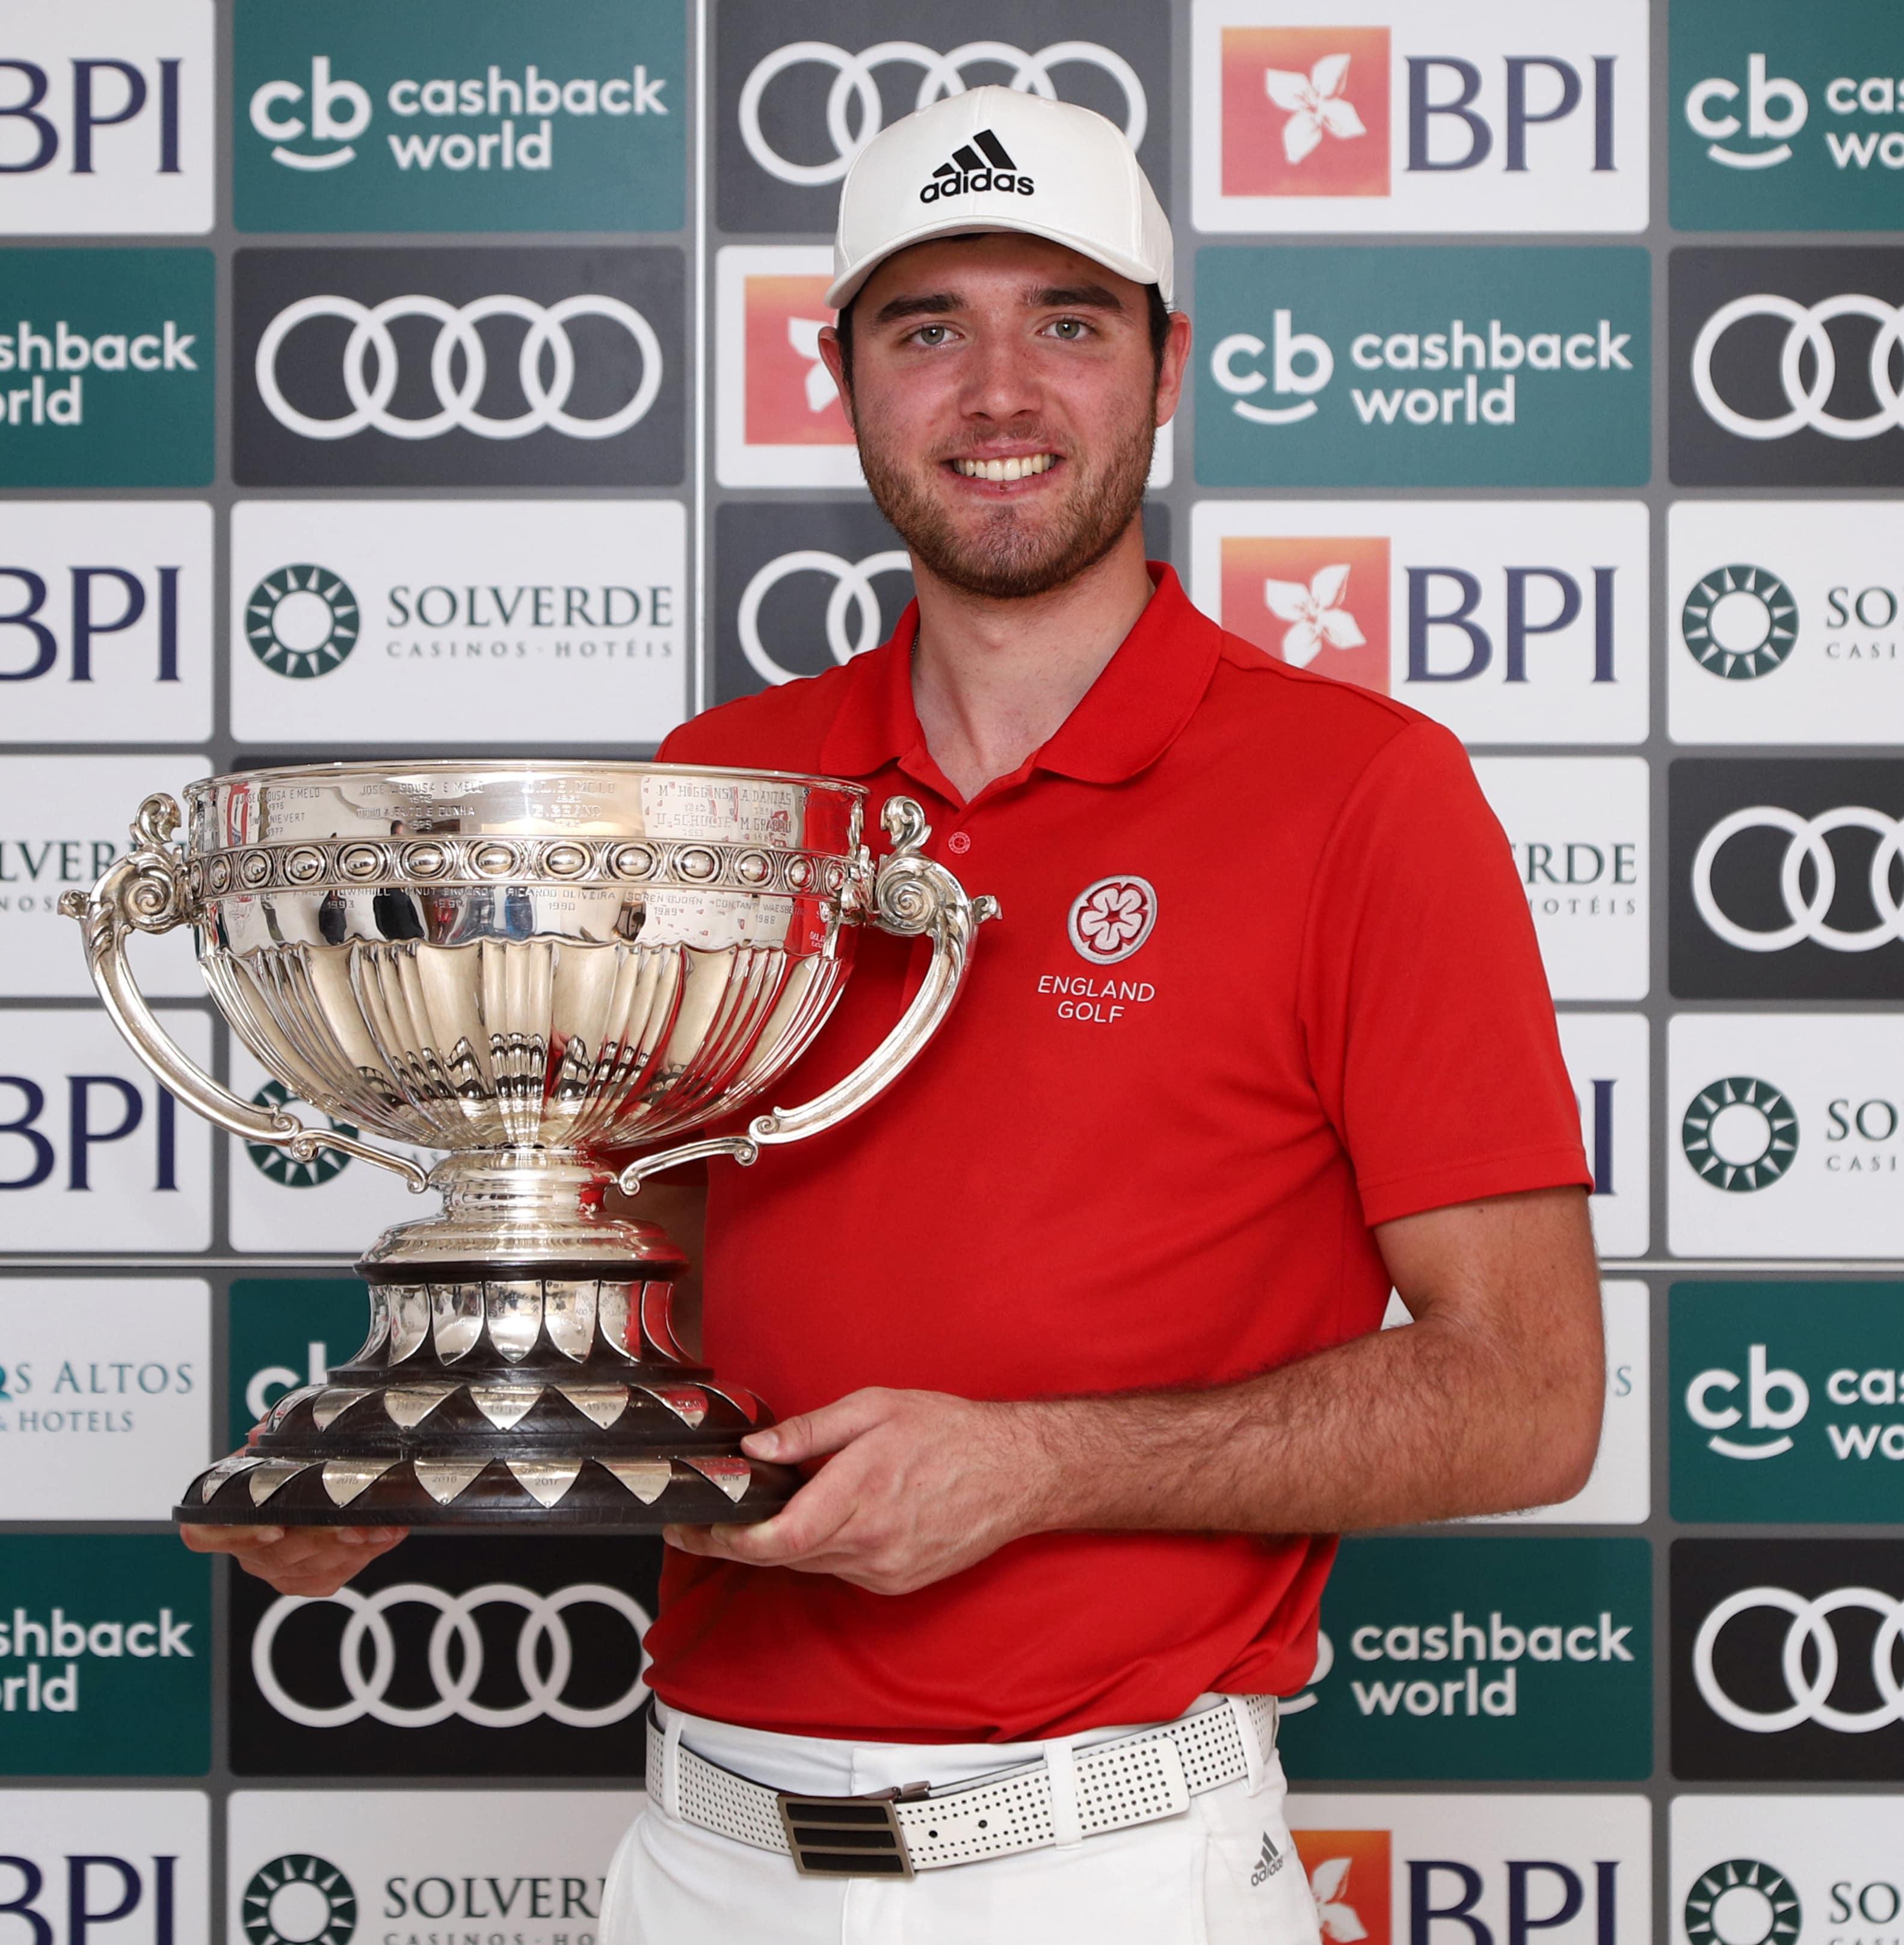 90th Portuguese International Amateur Championship – Inglês Harry Goddard campeão  com vantagem mínima sobre Pedro Lencart